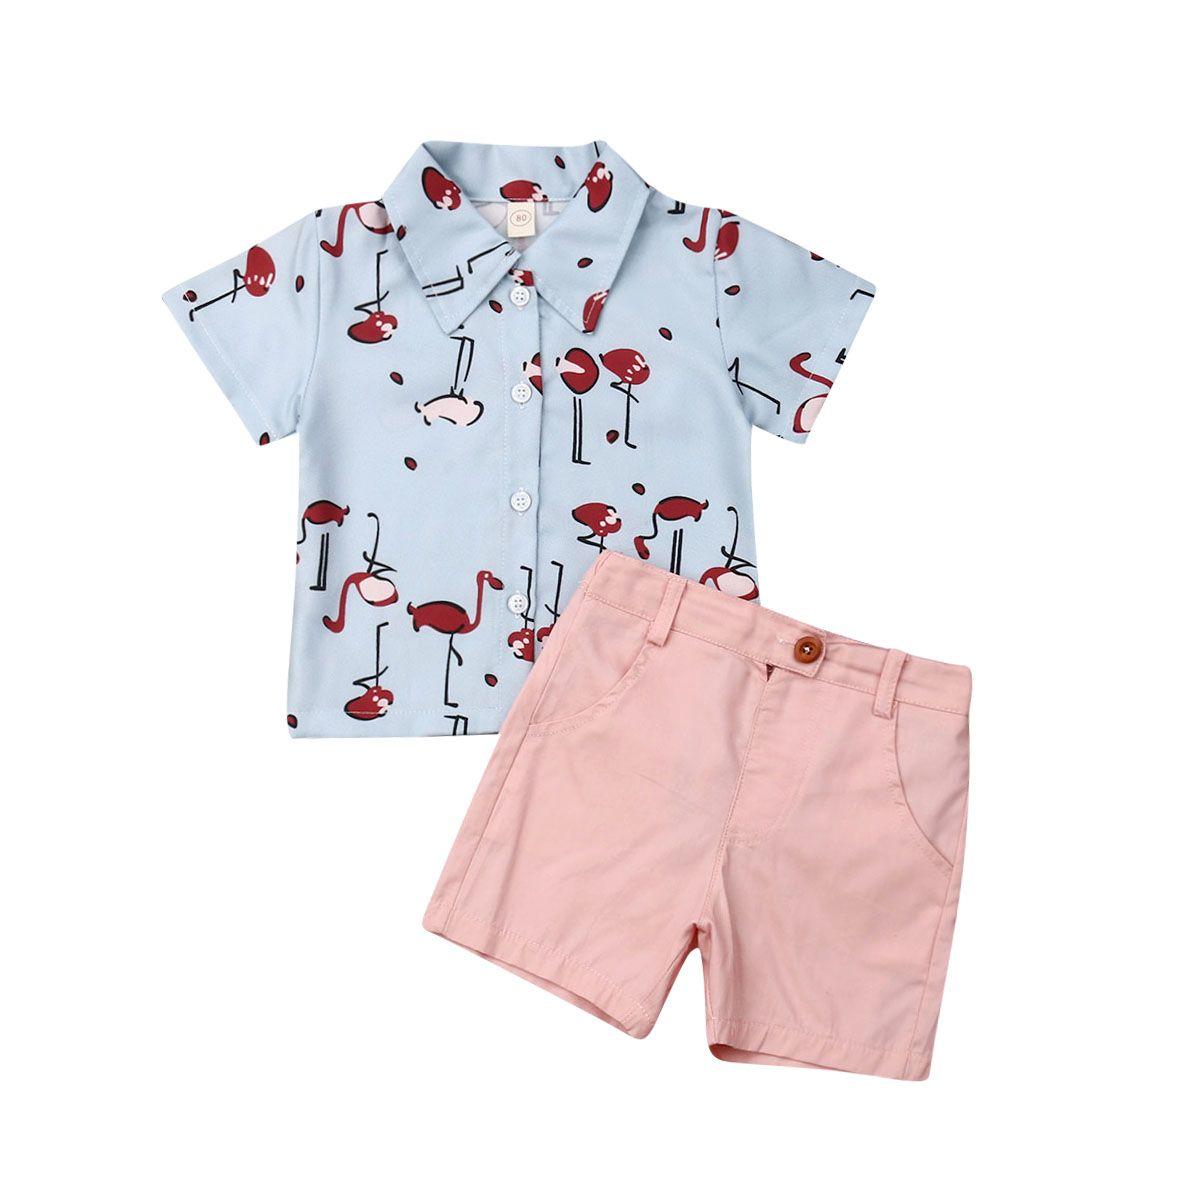 UK Fashion Toddler Baby Kids Boy Shirt Tops+Pants Flamingo Outfits Clothes Set